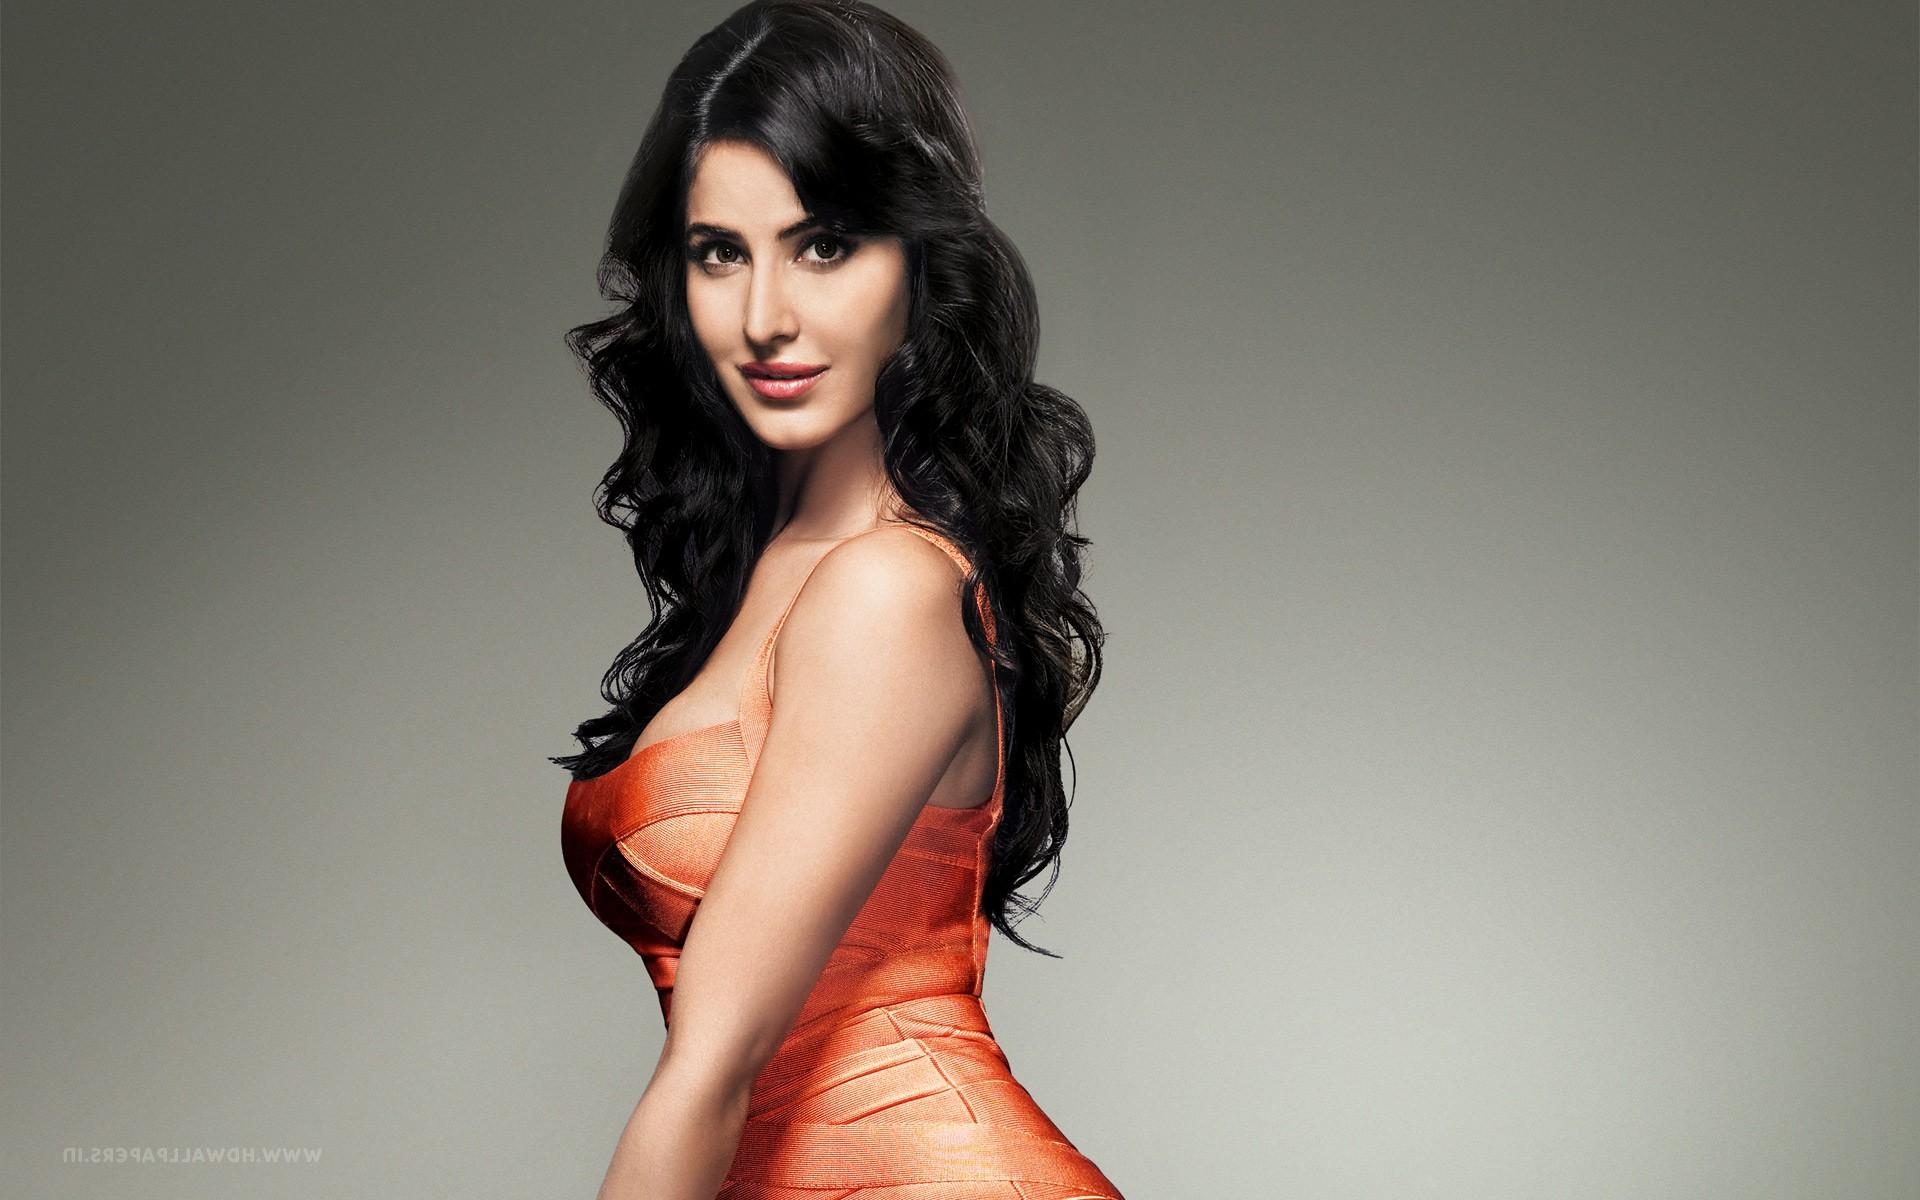 Katrina Kaif 5, HD Celebrities, 4k Wallpapers, Images